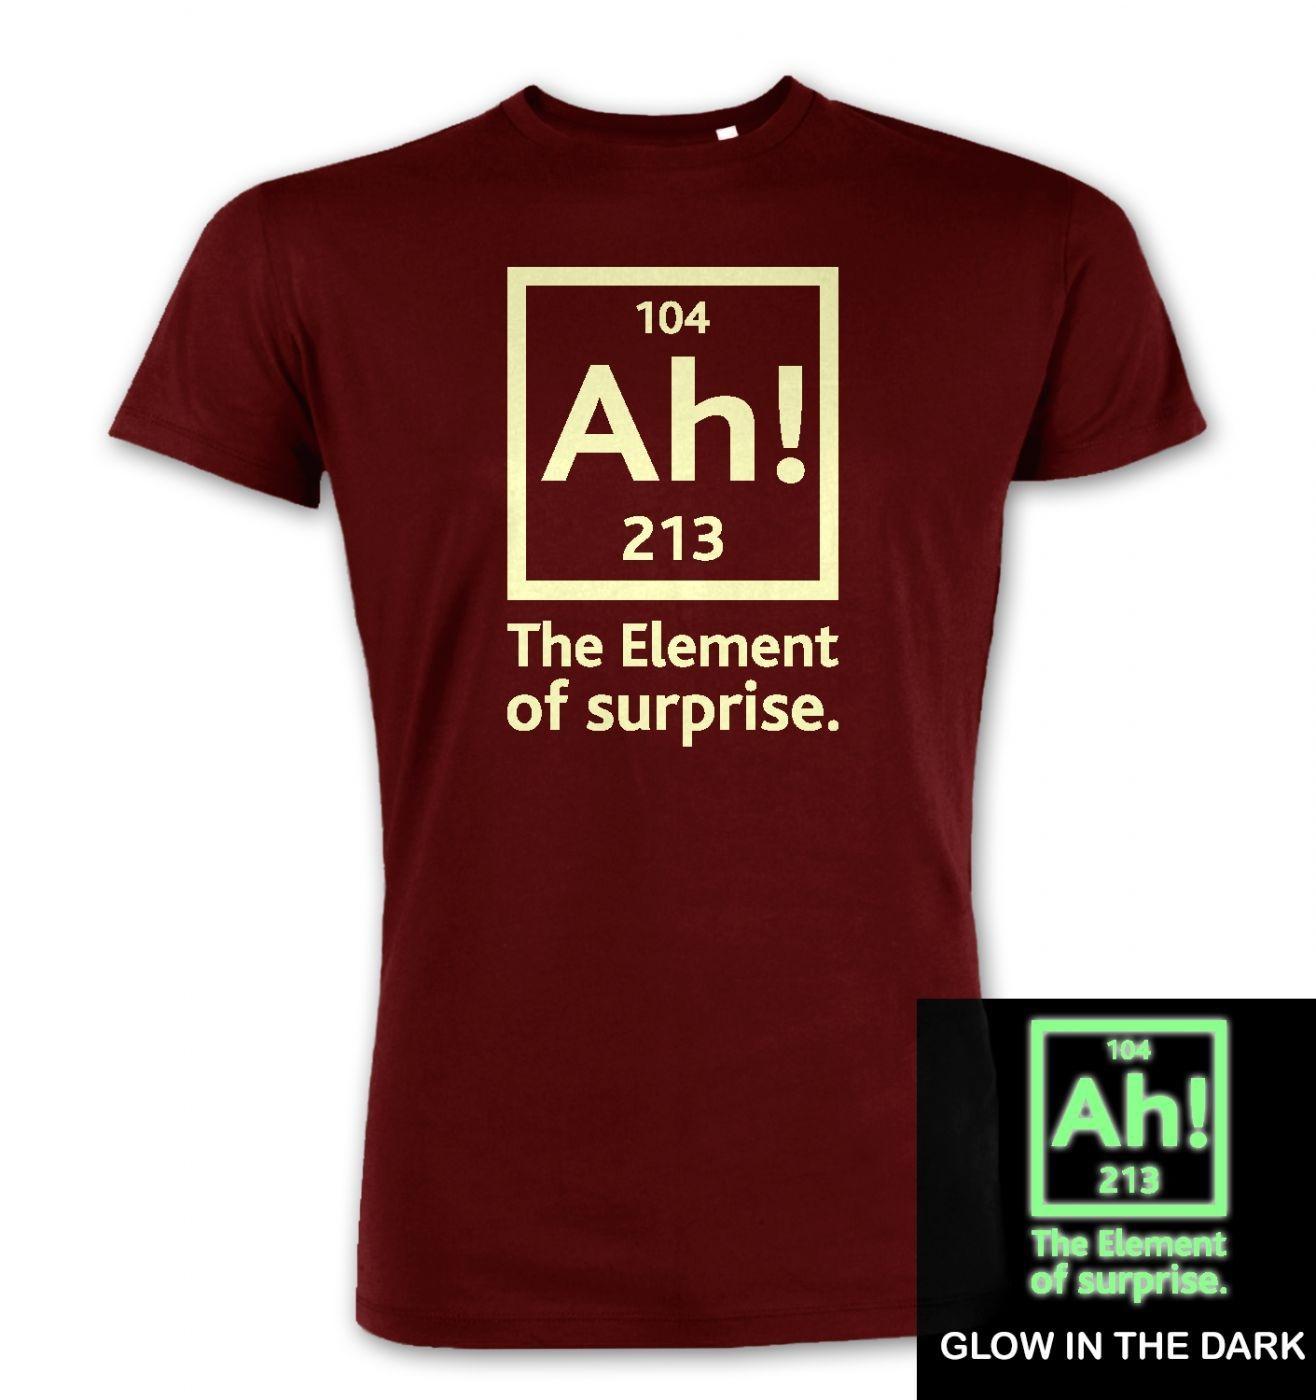 1e3127b62 Ah! The Element of Surprise (glow in the dark) premium t-shirt ...